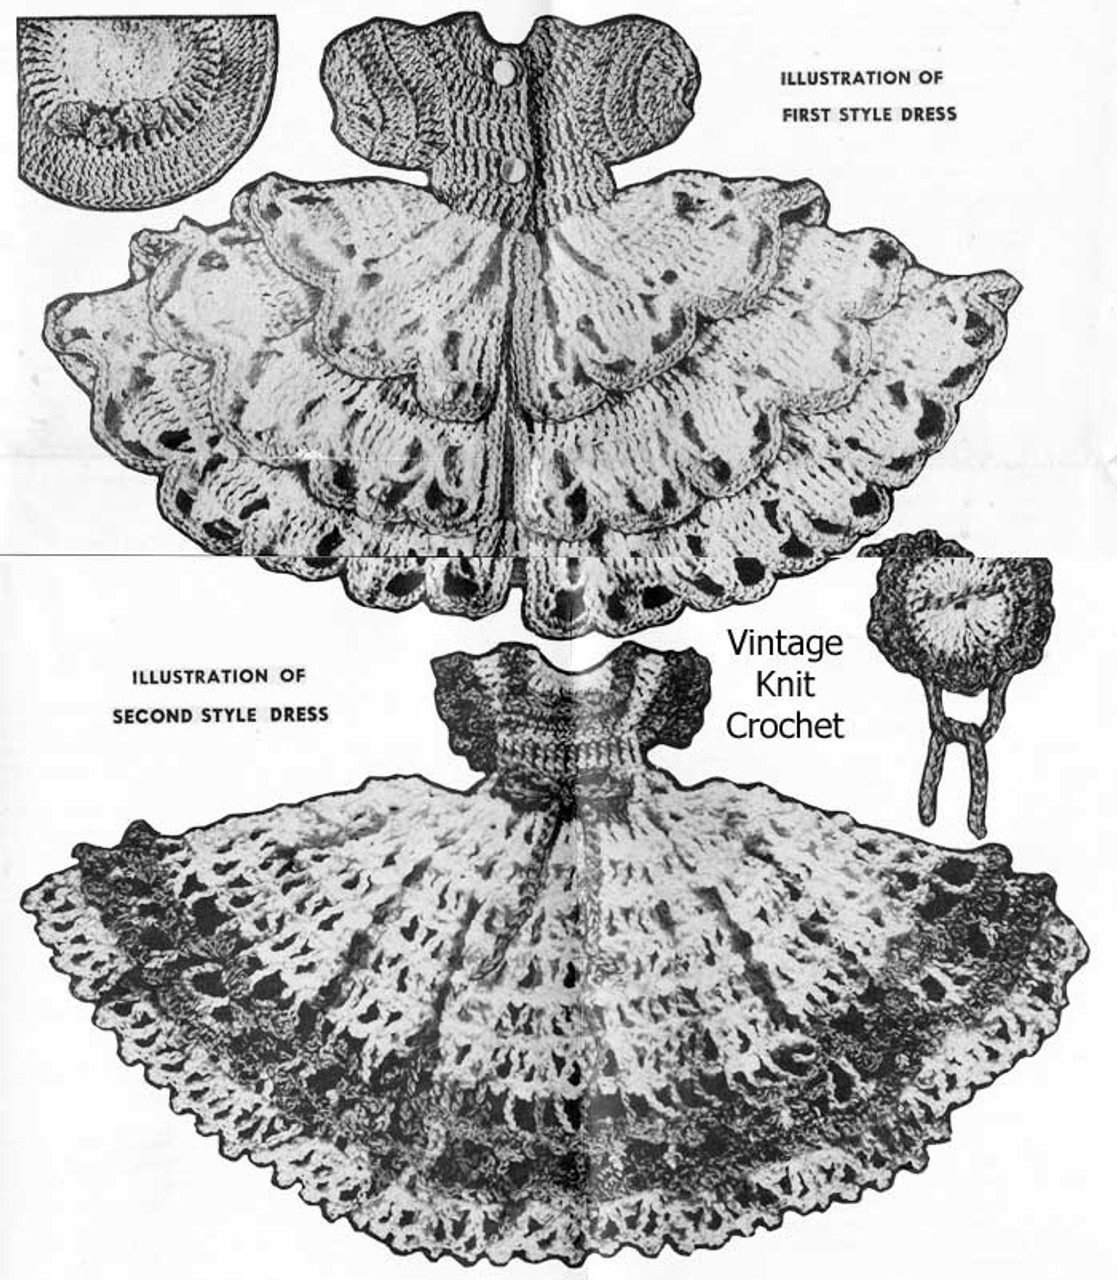 8 inch doll crochet dresses pattern, Laura wheeler 856